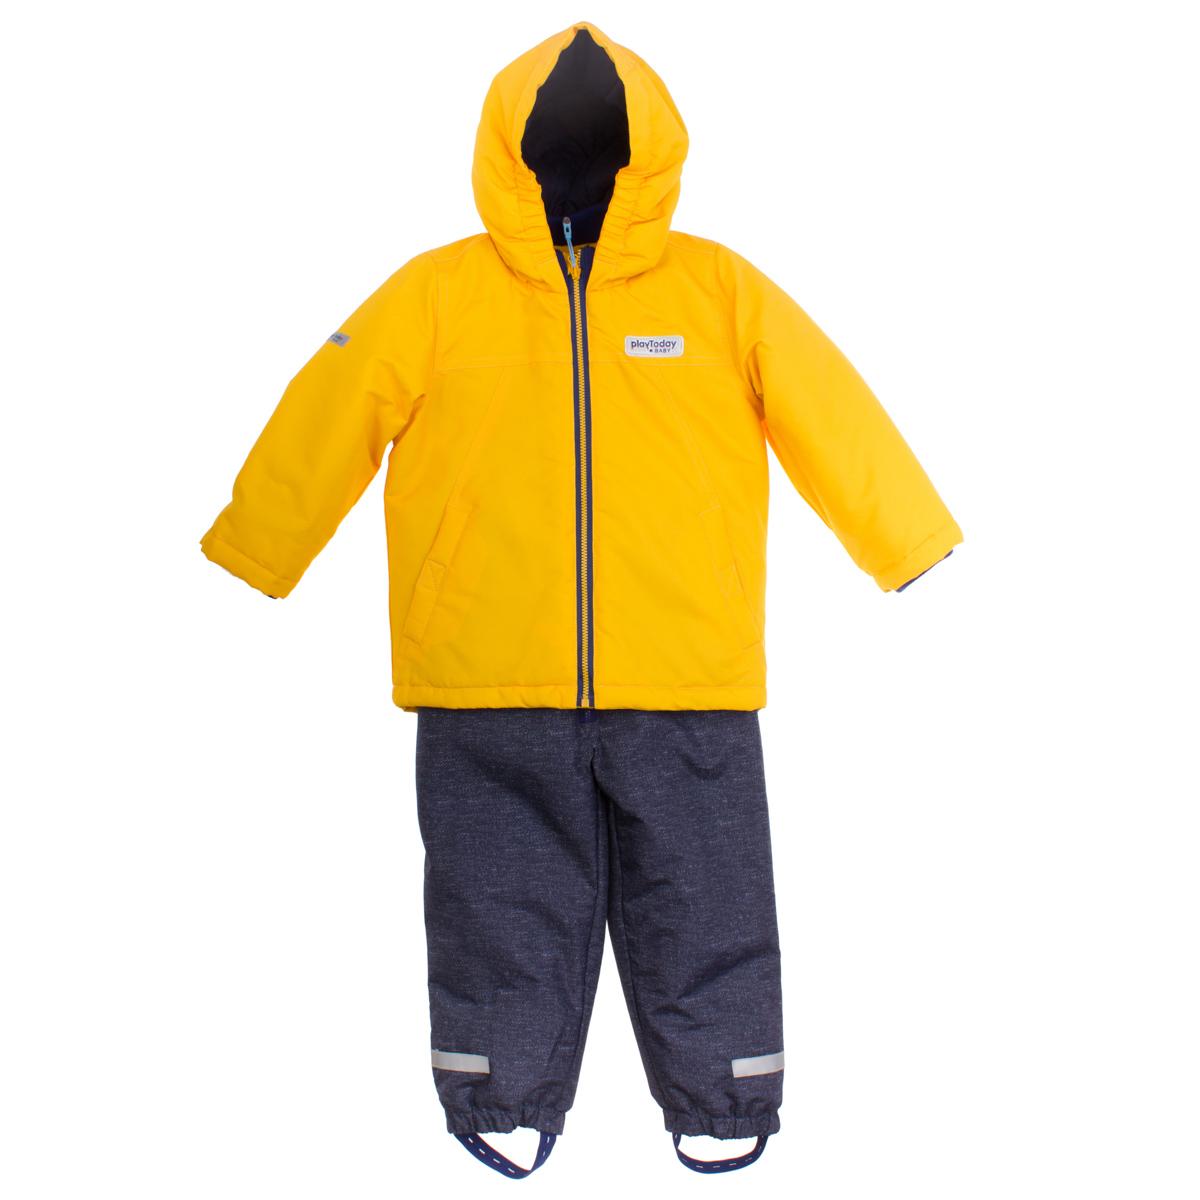 Комплект: куртка, полукомбинезон 167001